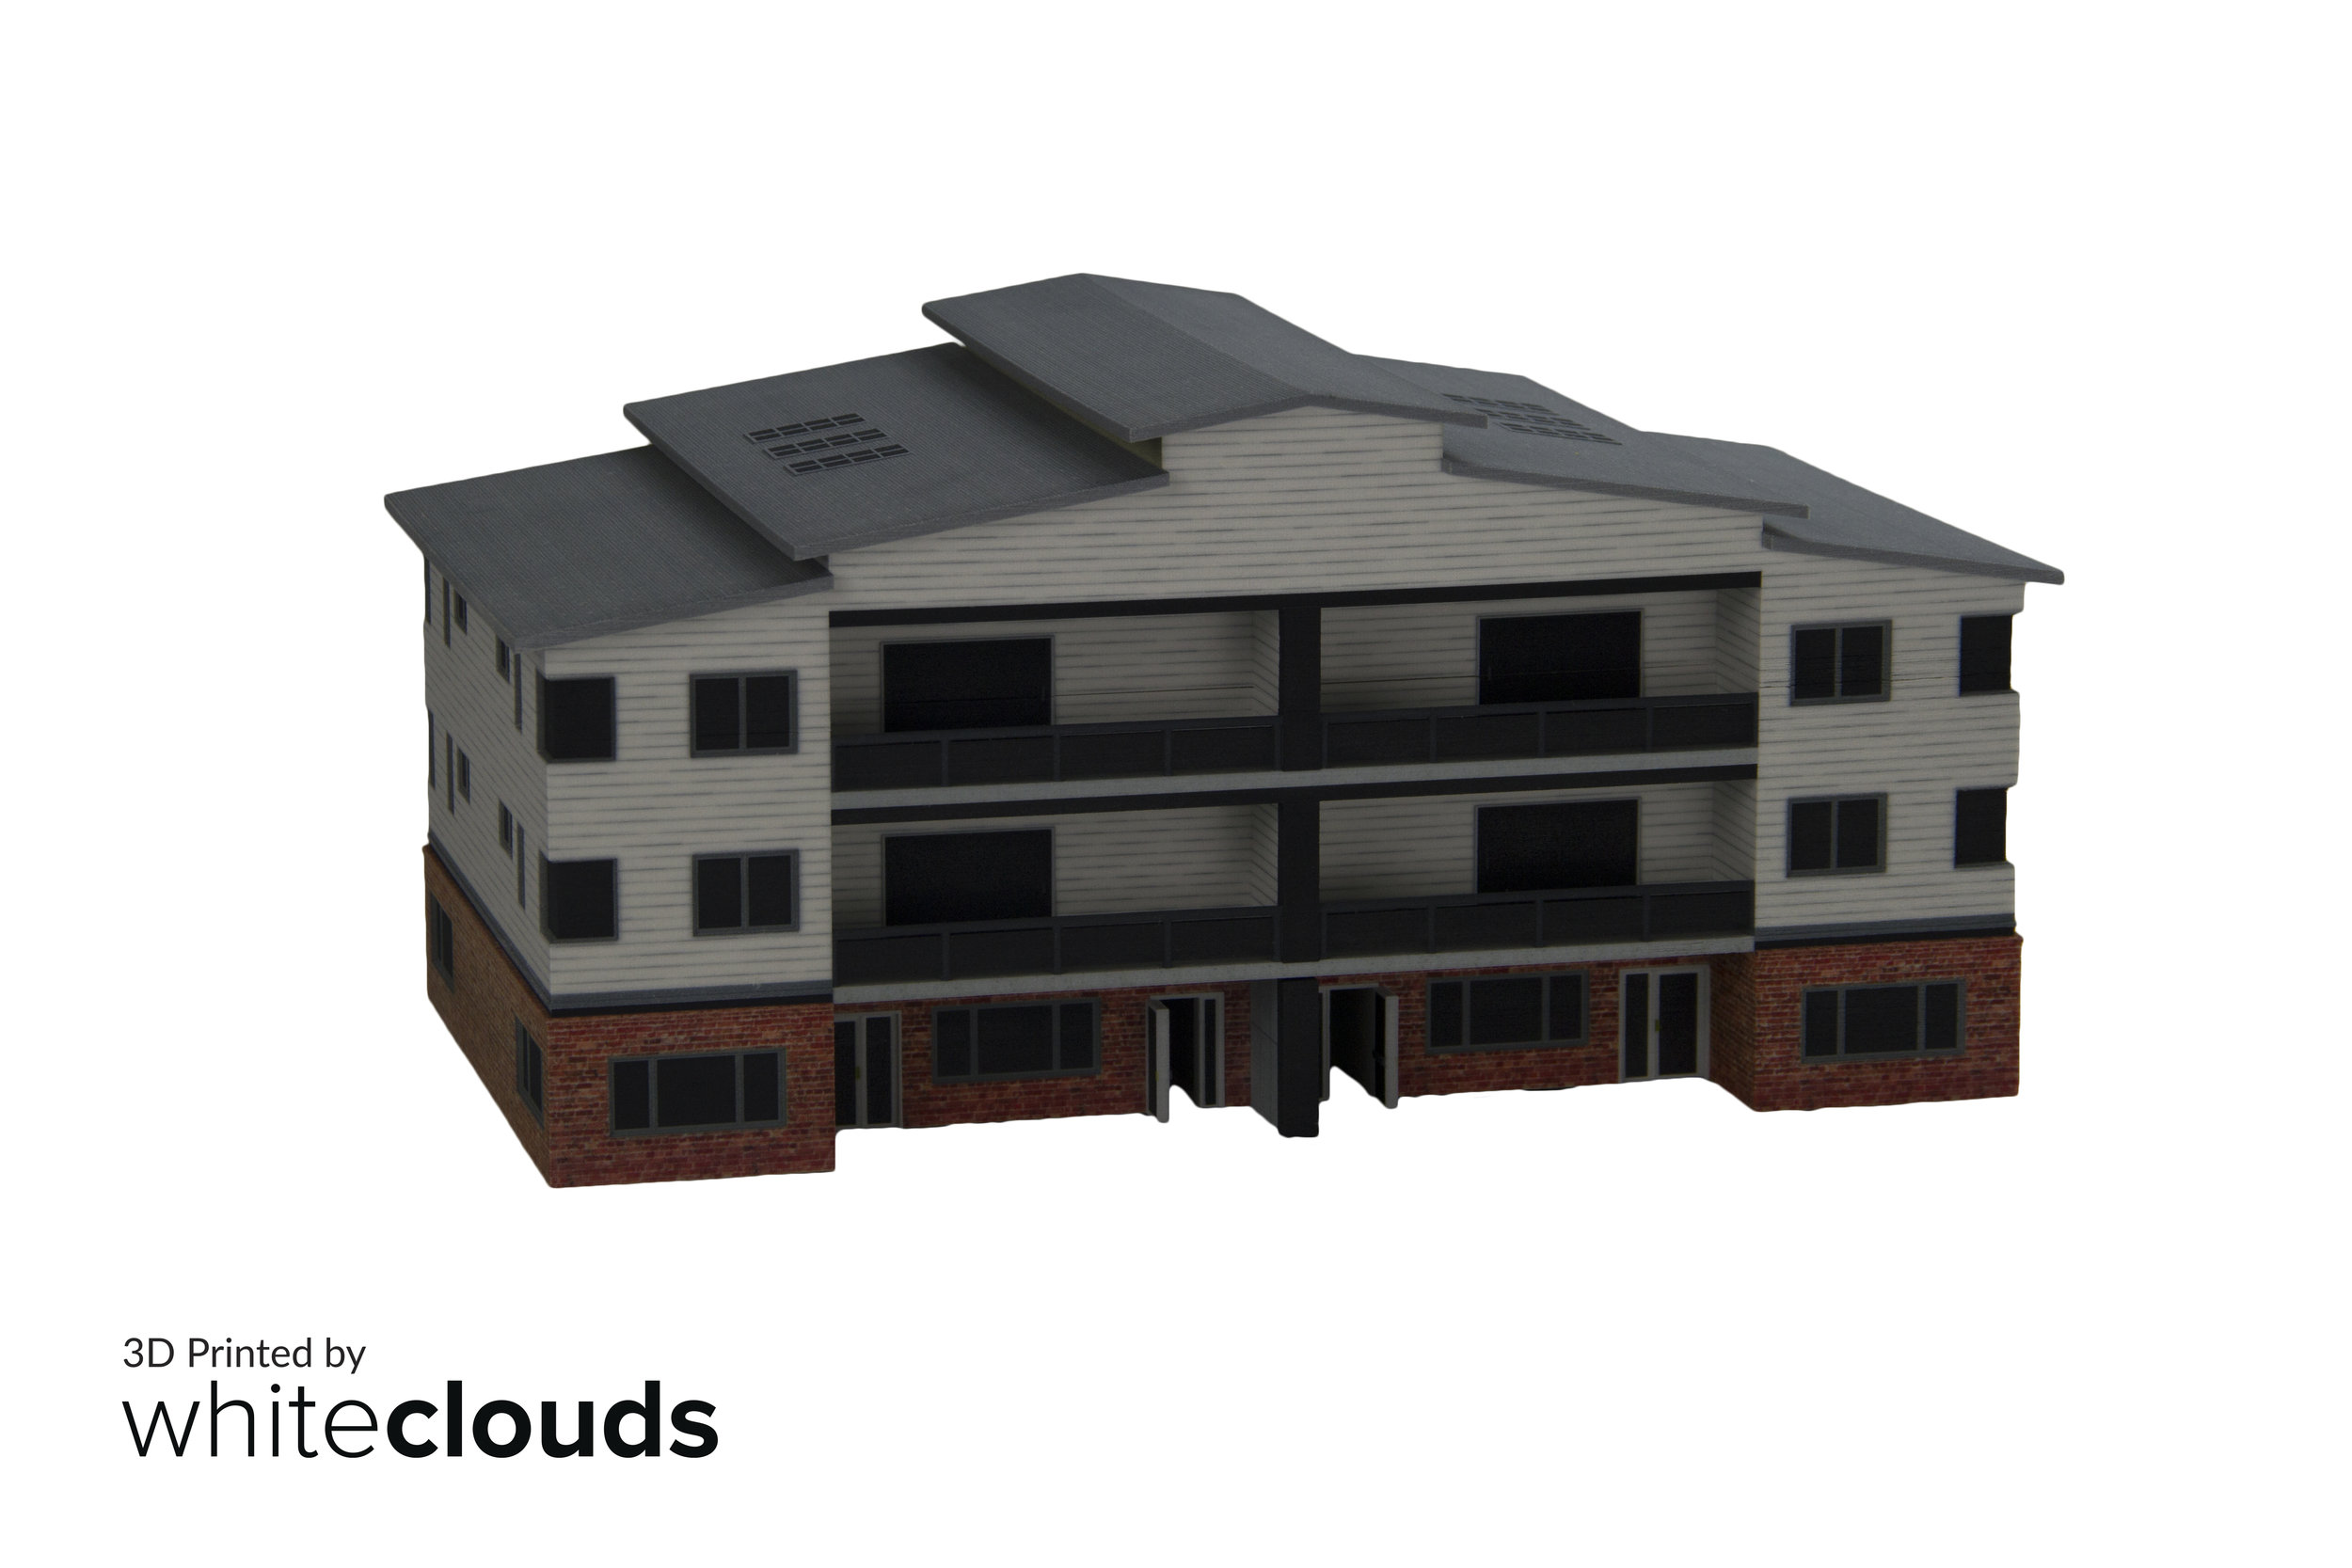 3D-Printed-WhiteCloud-BIM6x-2-Architecture-BIM6x-CR2-3.jpg